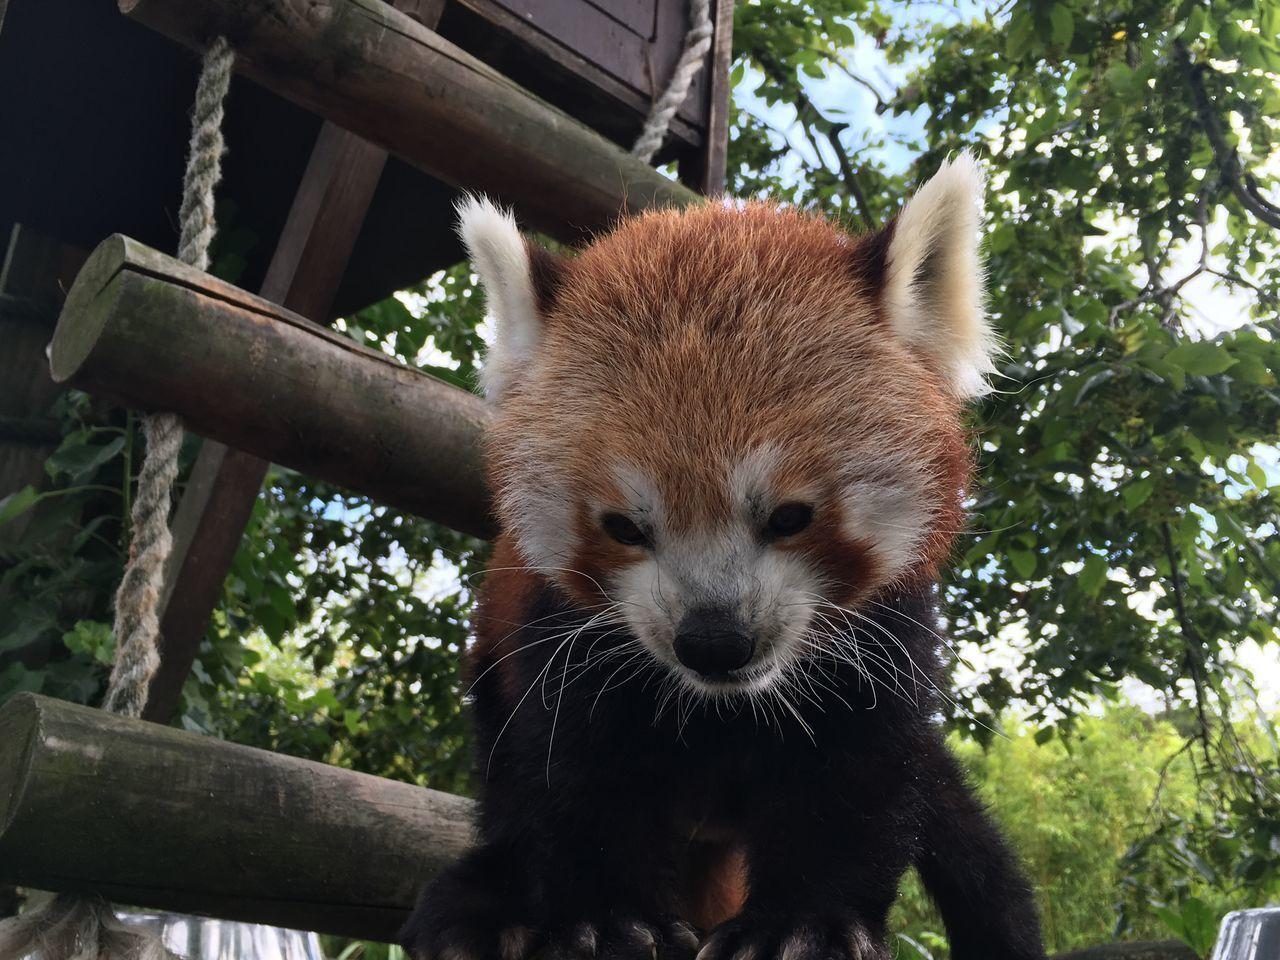 Close Up! Animal Themes Animals In The Wild Day Mammal No People One Animal Outdoors Panda Panda - Animal Portrait Red Panda Red Panda Tree